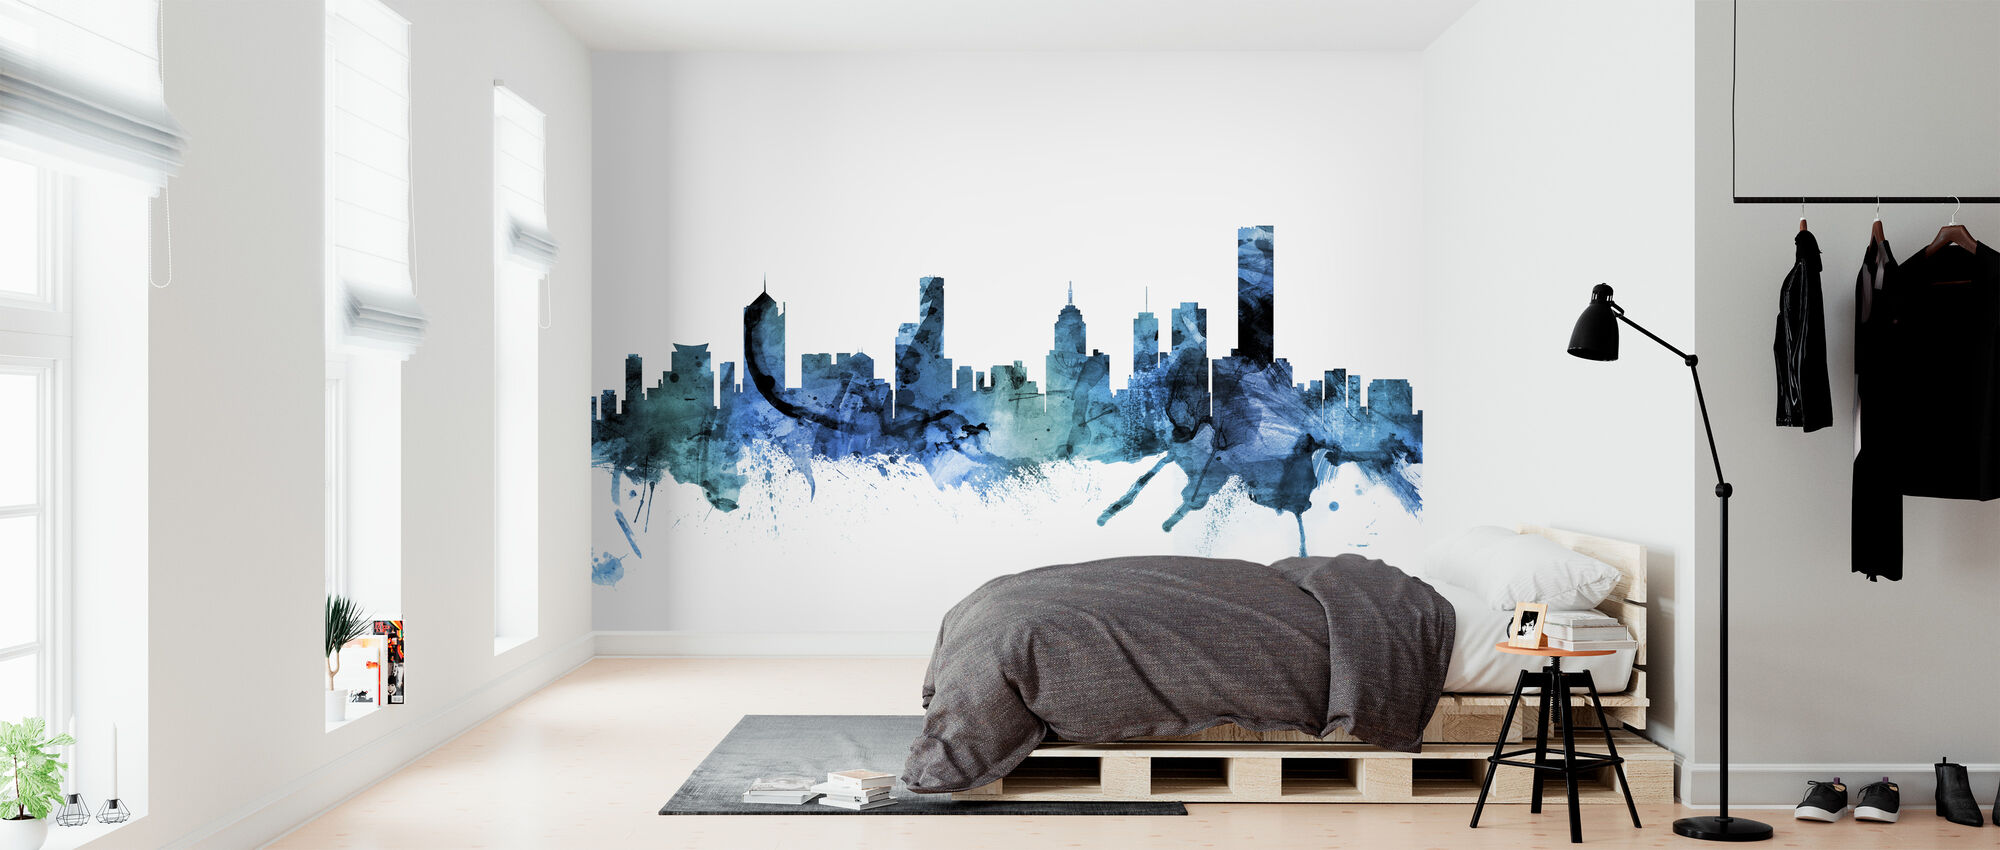 Skyline van Melbourne Australië - Behang - Slaapkamer